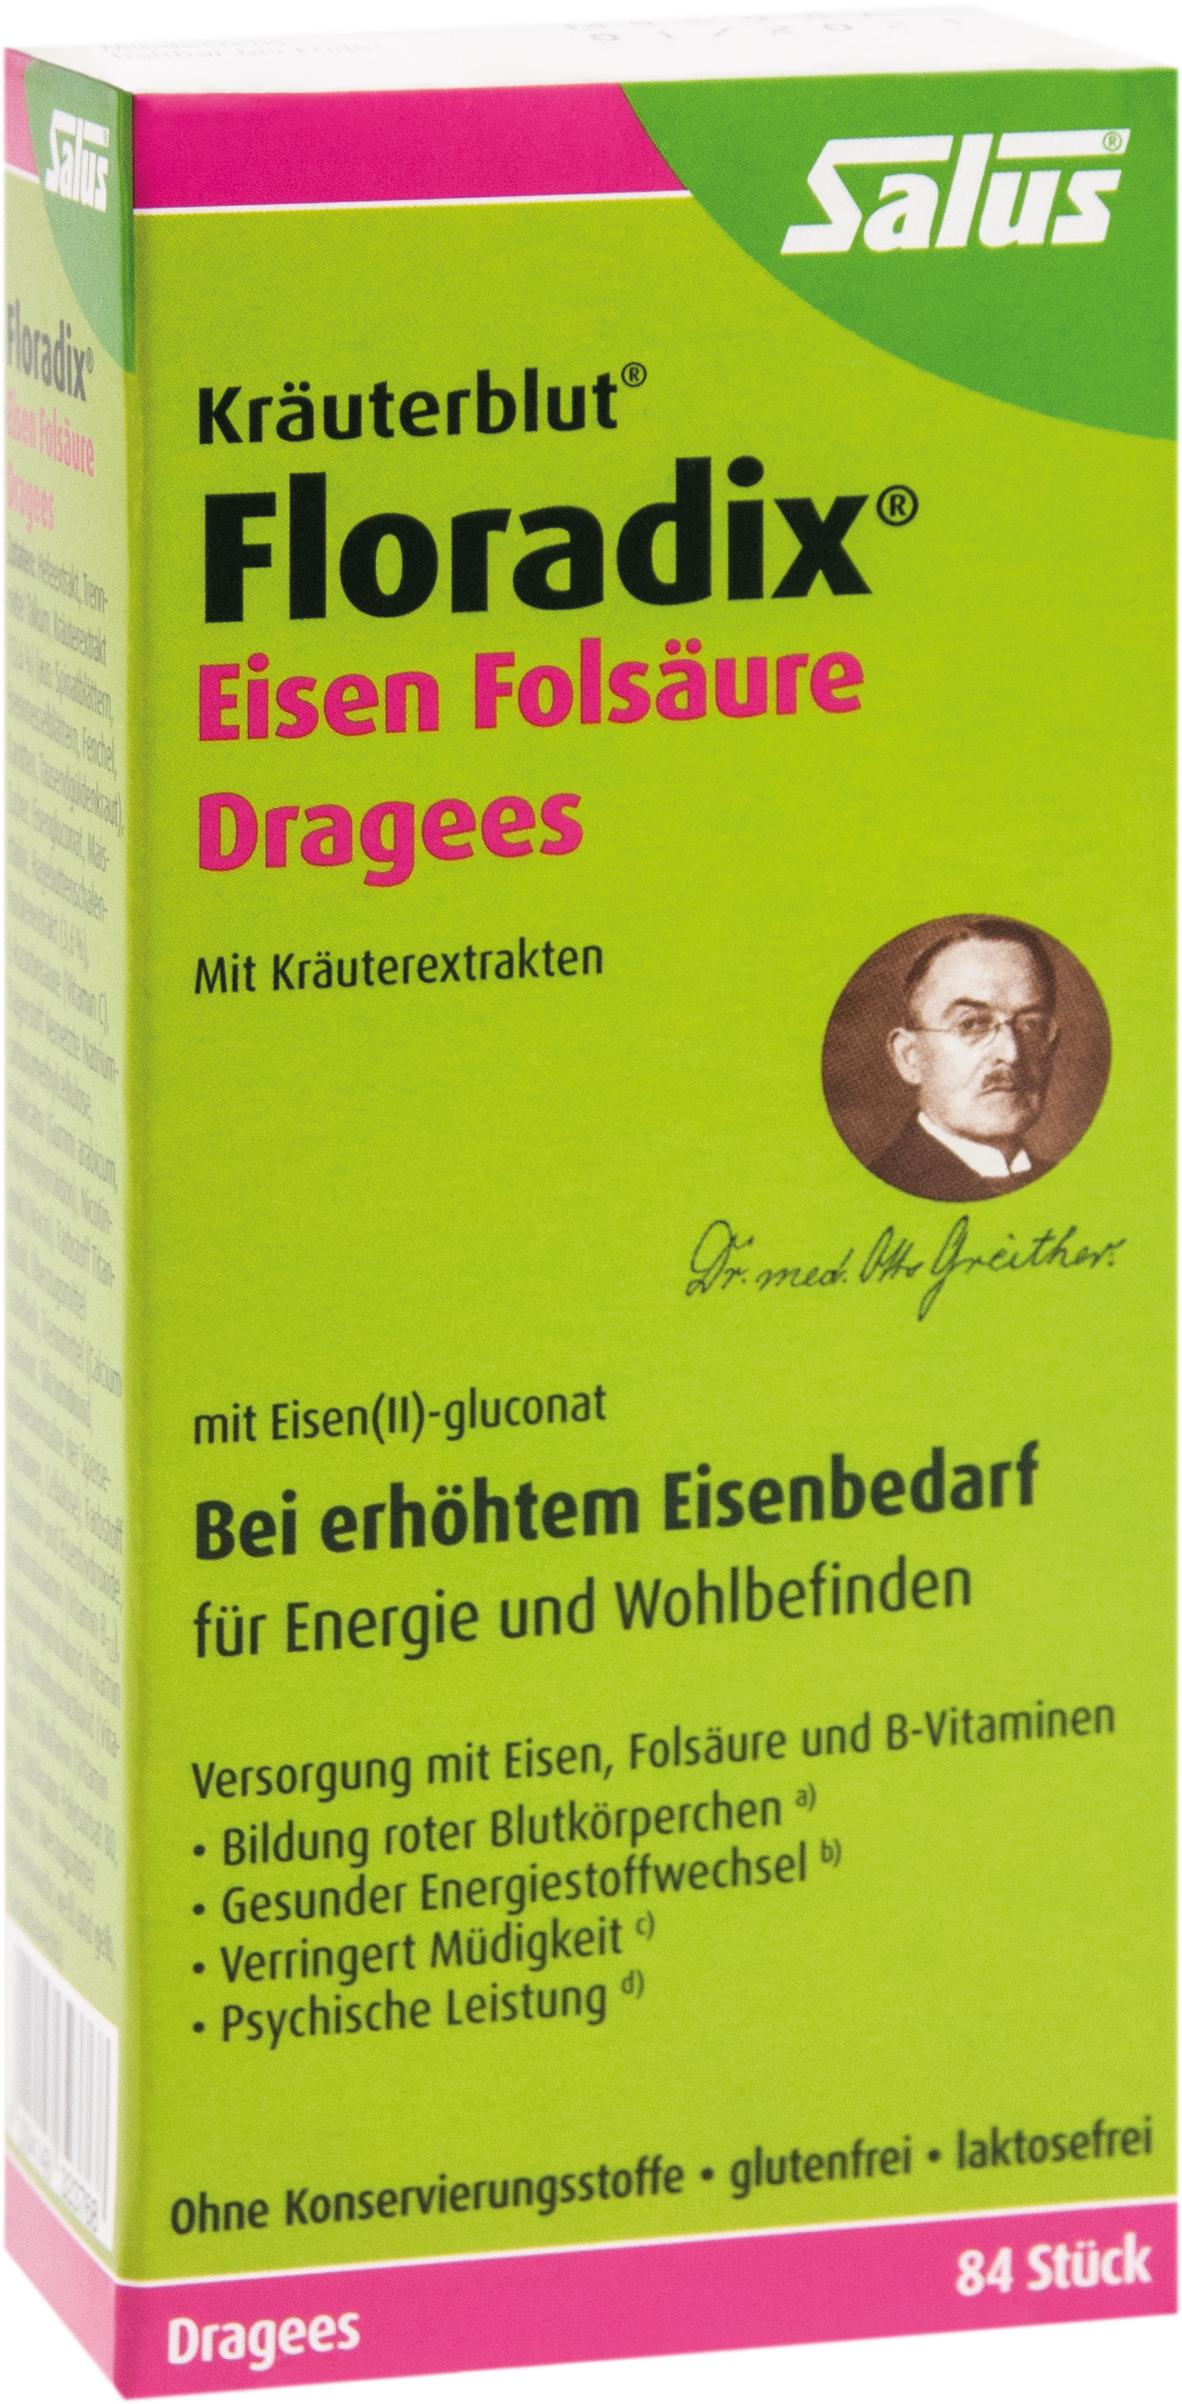 Floradix Eisen Folsäure Dragees